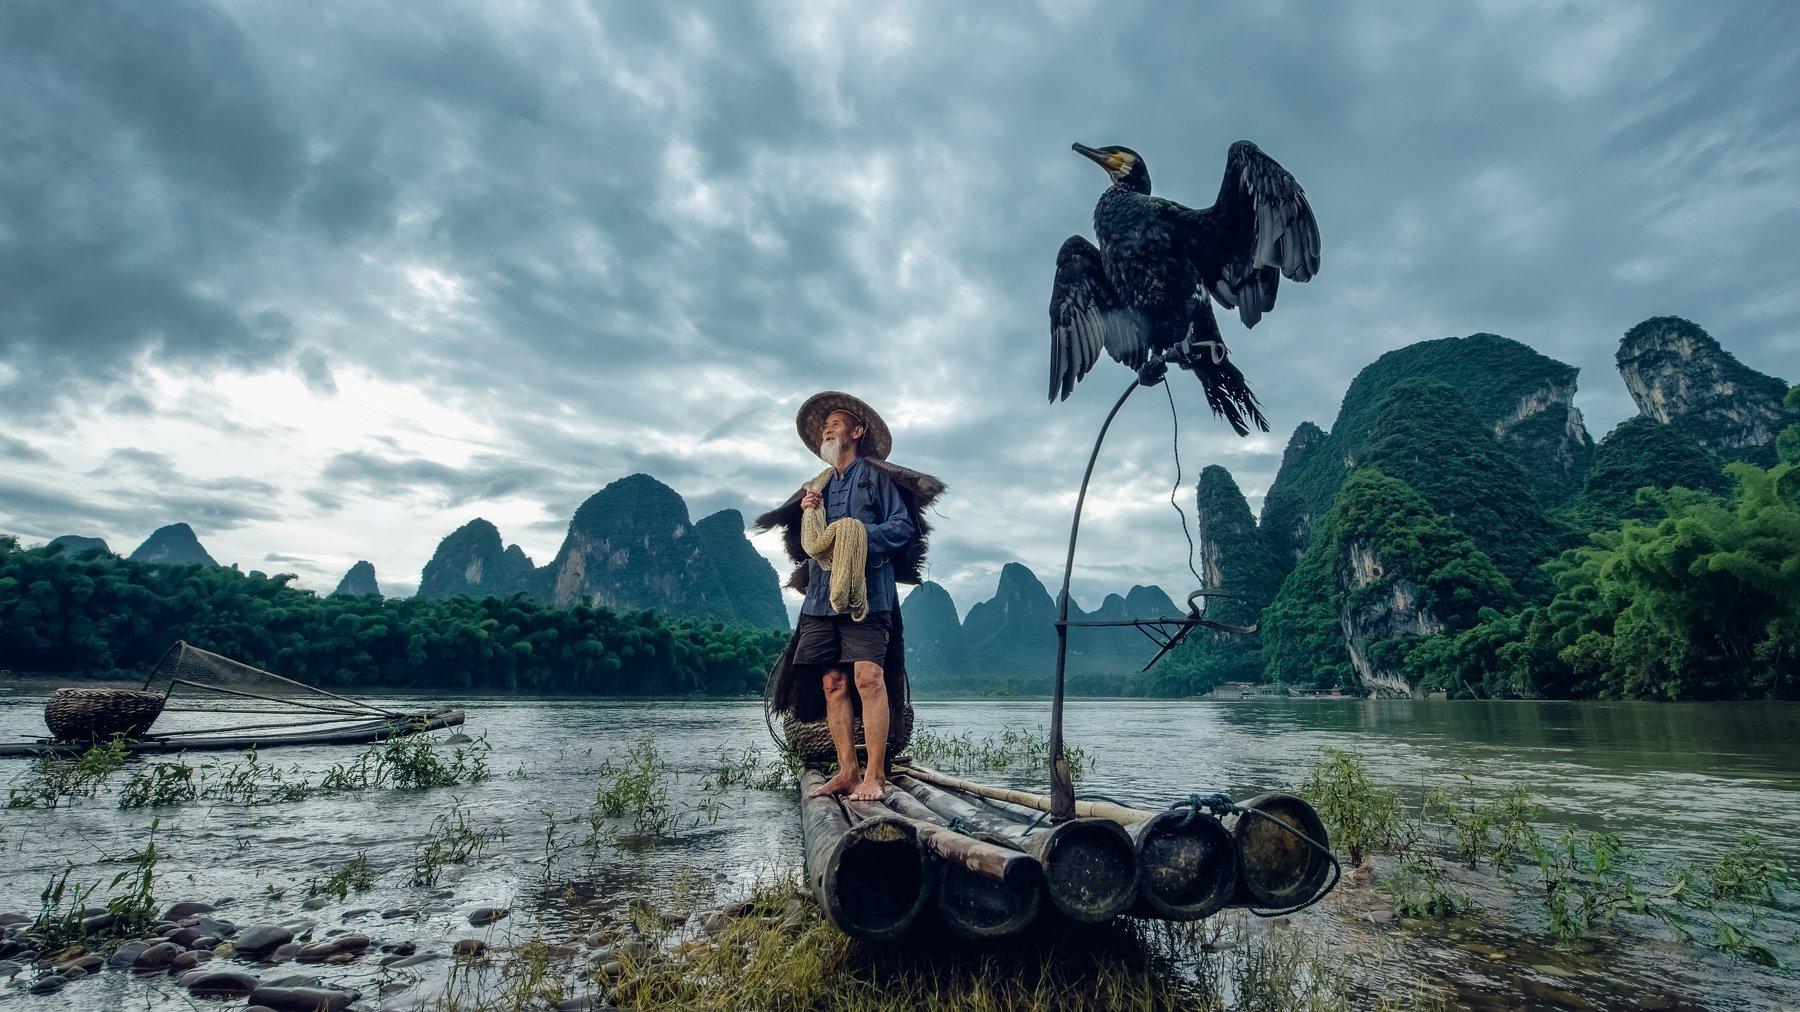 china, guilin,bird,river,mountain,cloud,boat,aisa,asian,, Adirek M